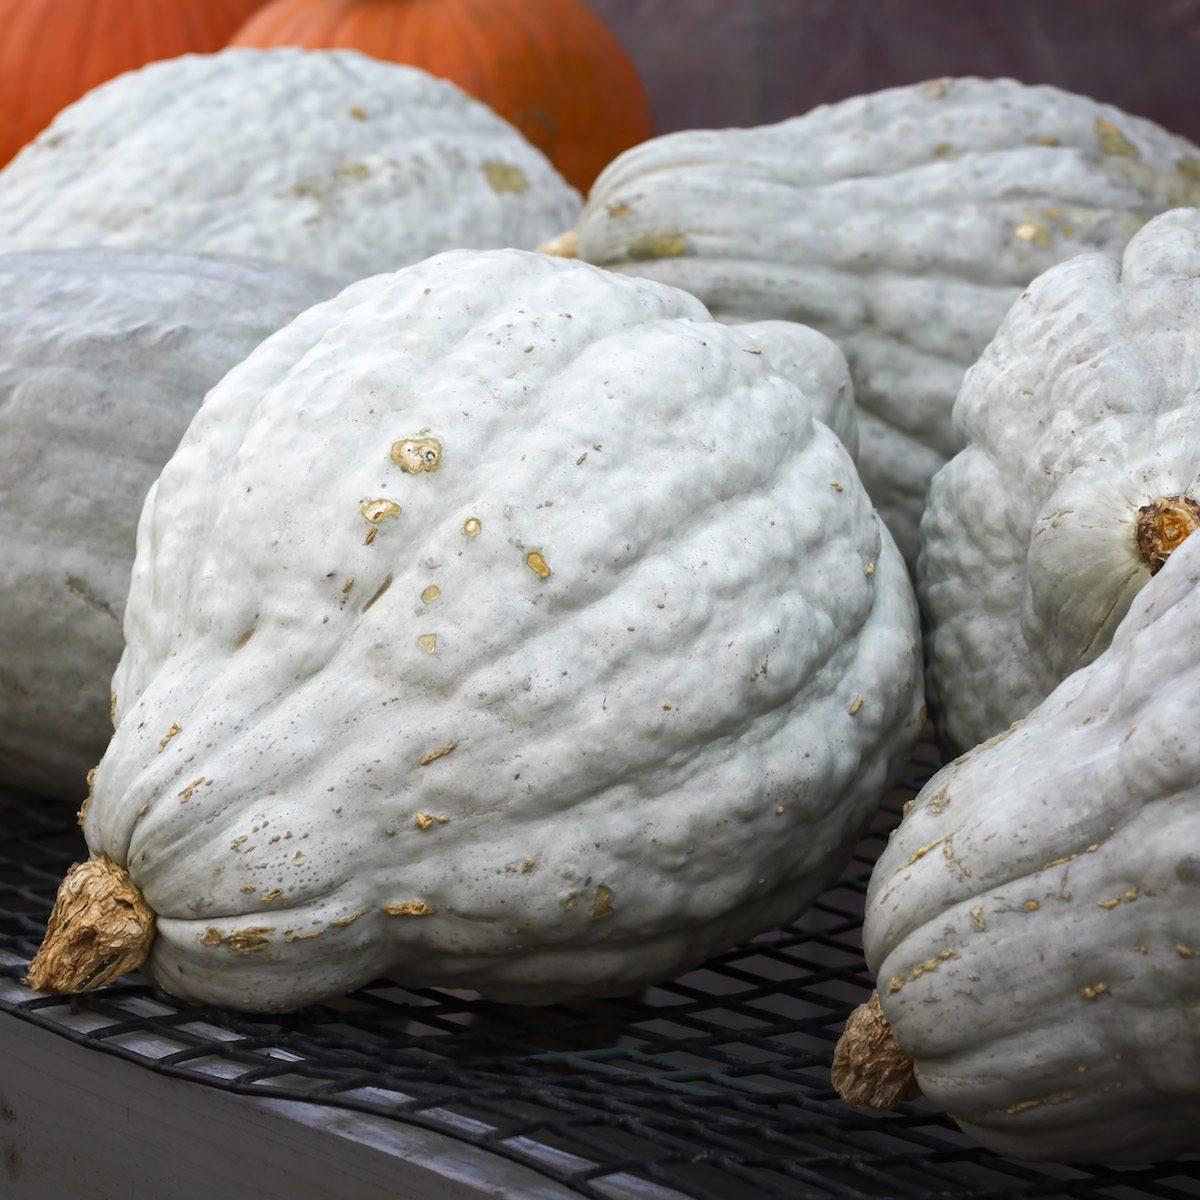 Blue hubbard squash and pumpkins sold in a farm